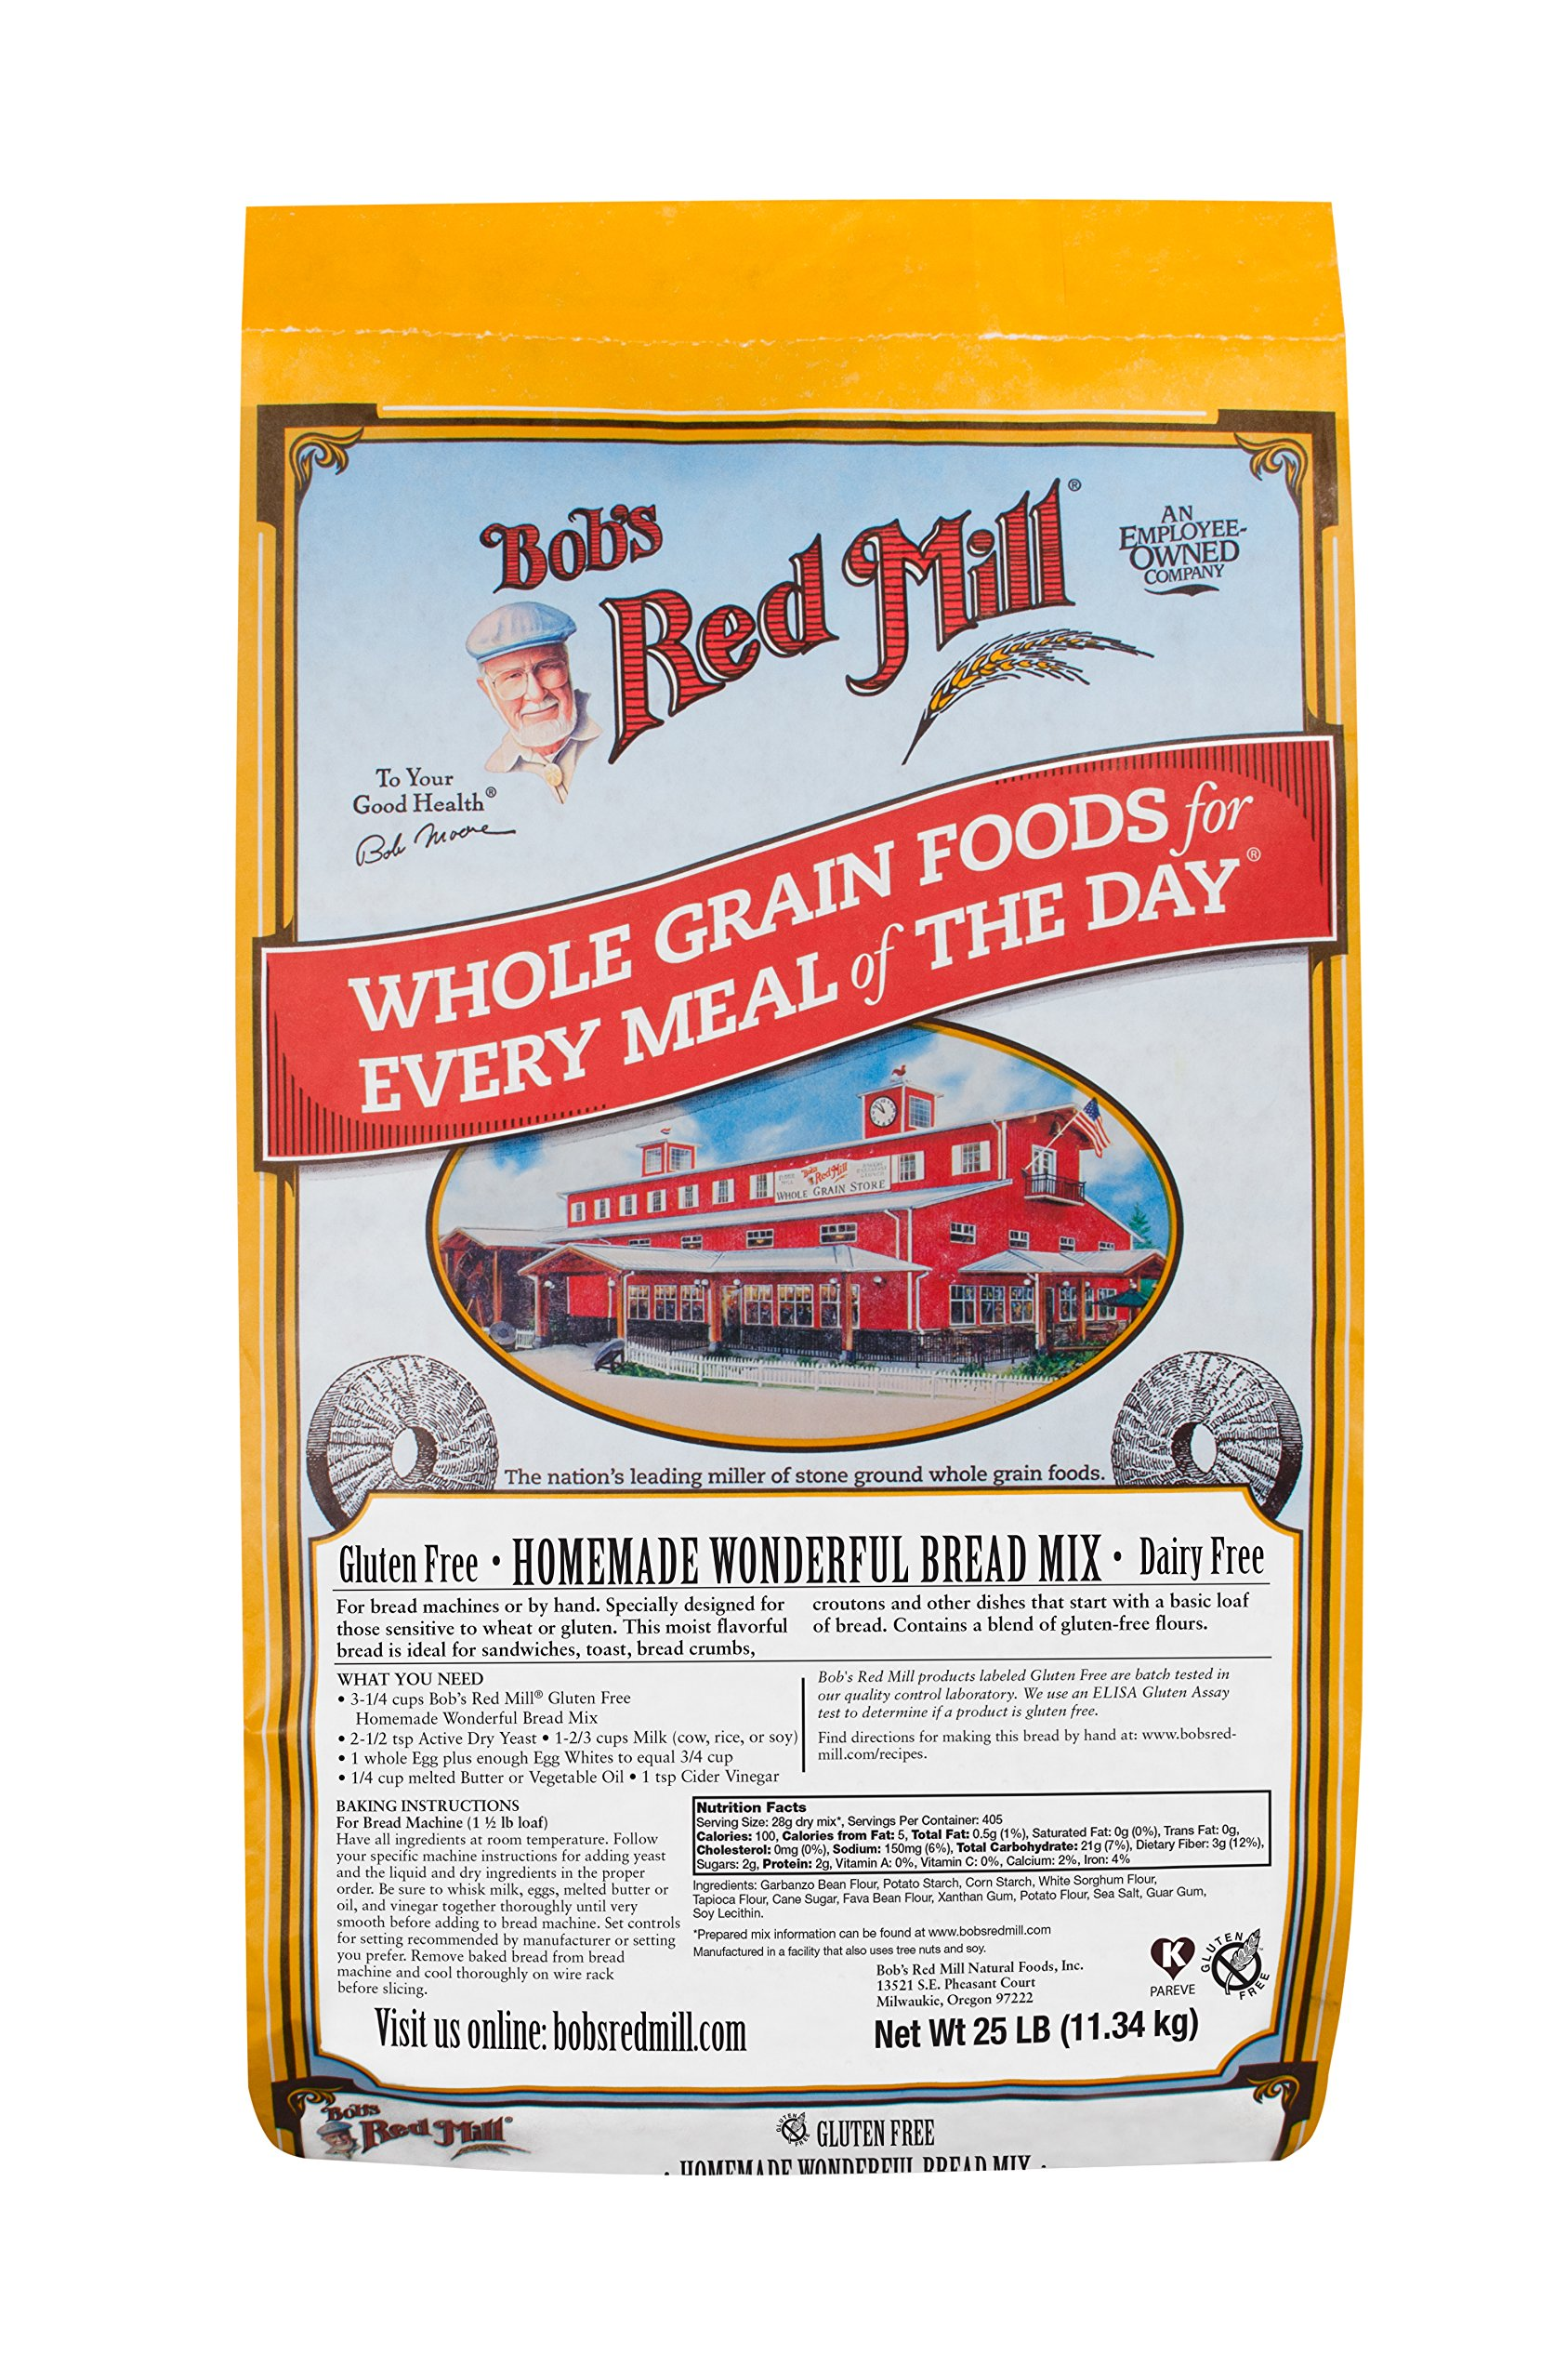 Bob's Red Mill Bulk Mix Bread, Homemade, Gluten Free, 1602B25, 25-Pound (Pack of 1)